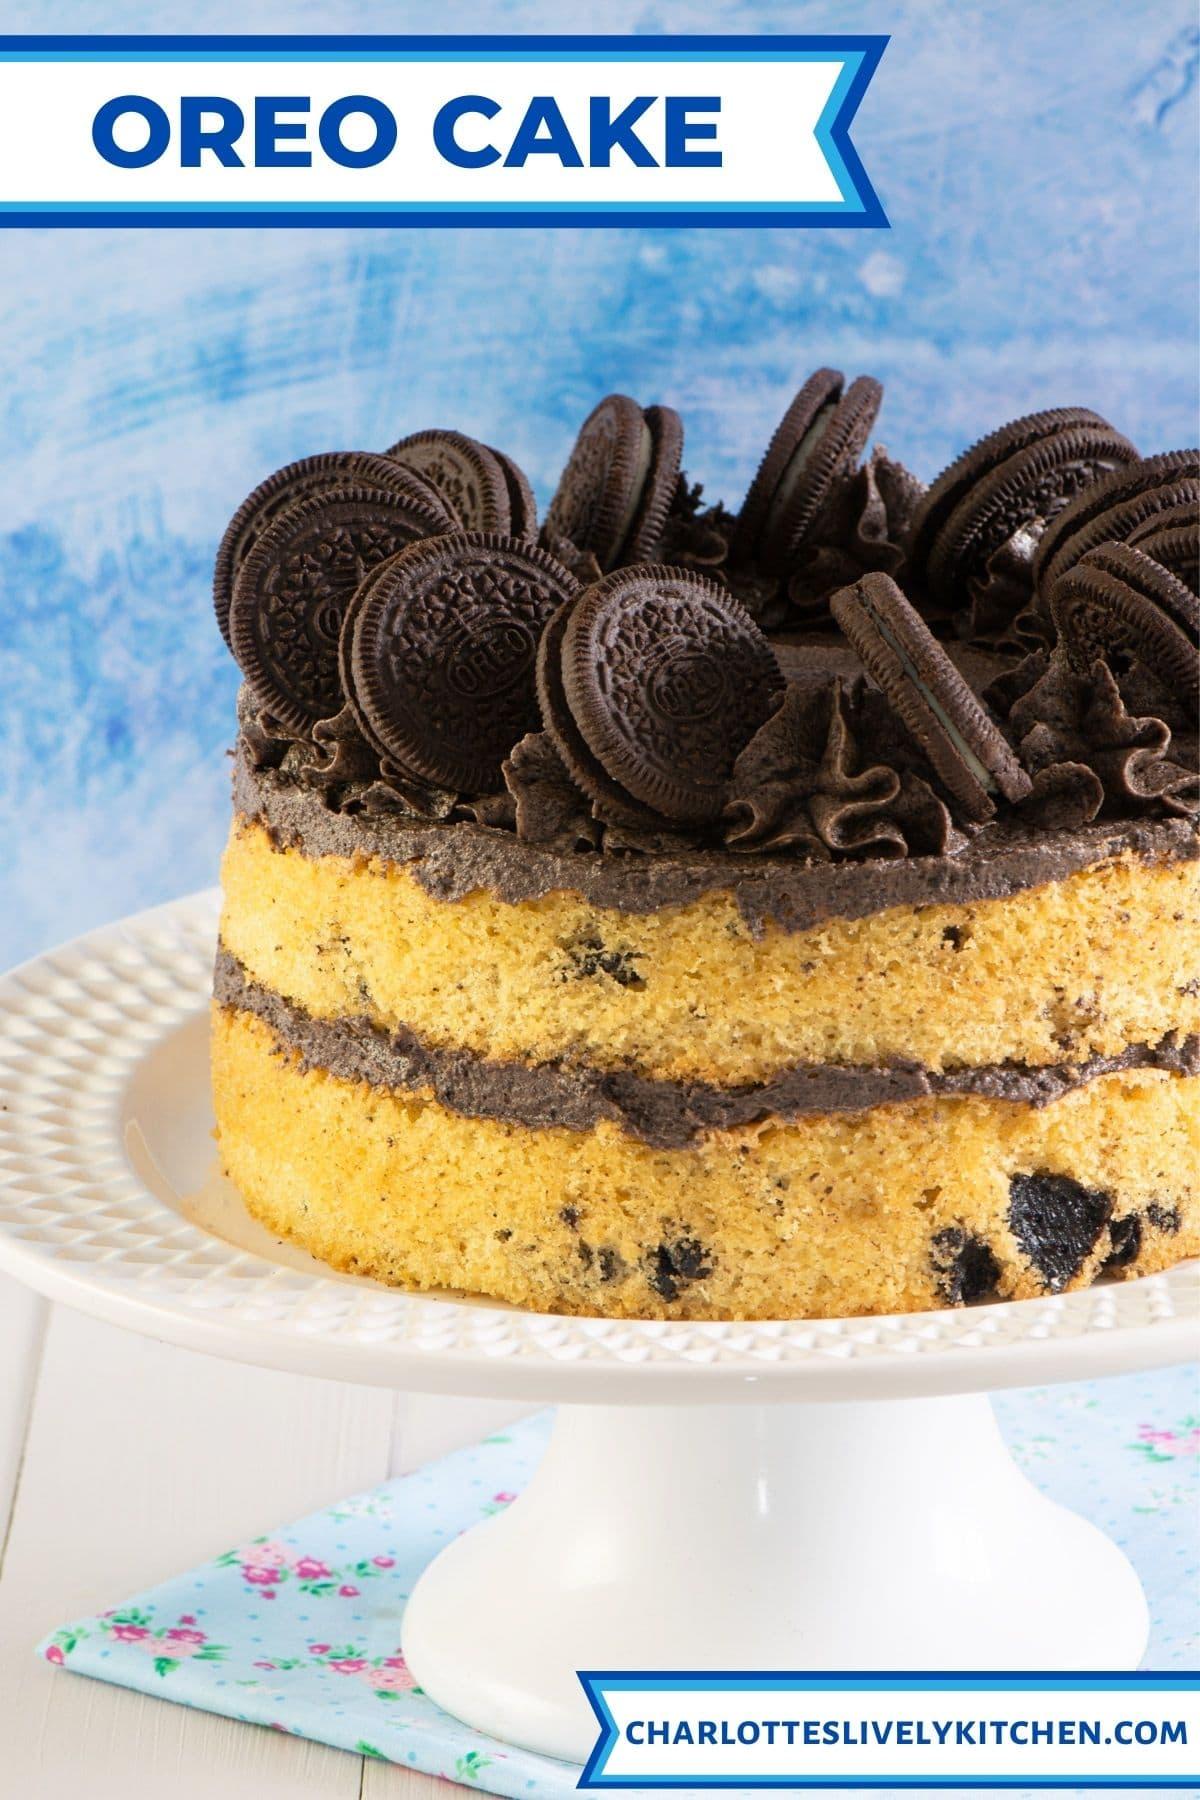 Oreo cake on a cake stand.